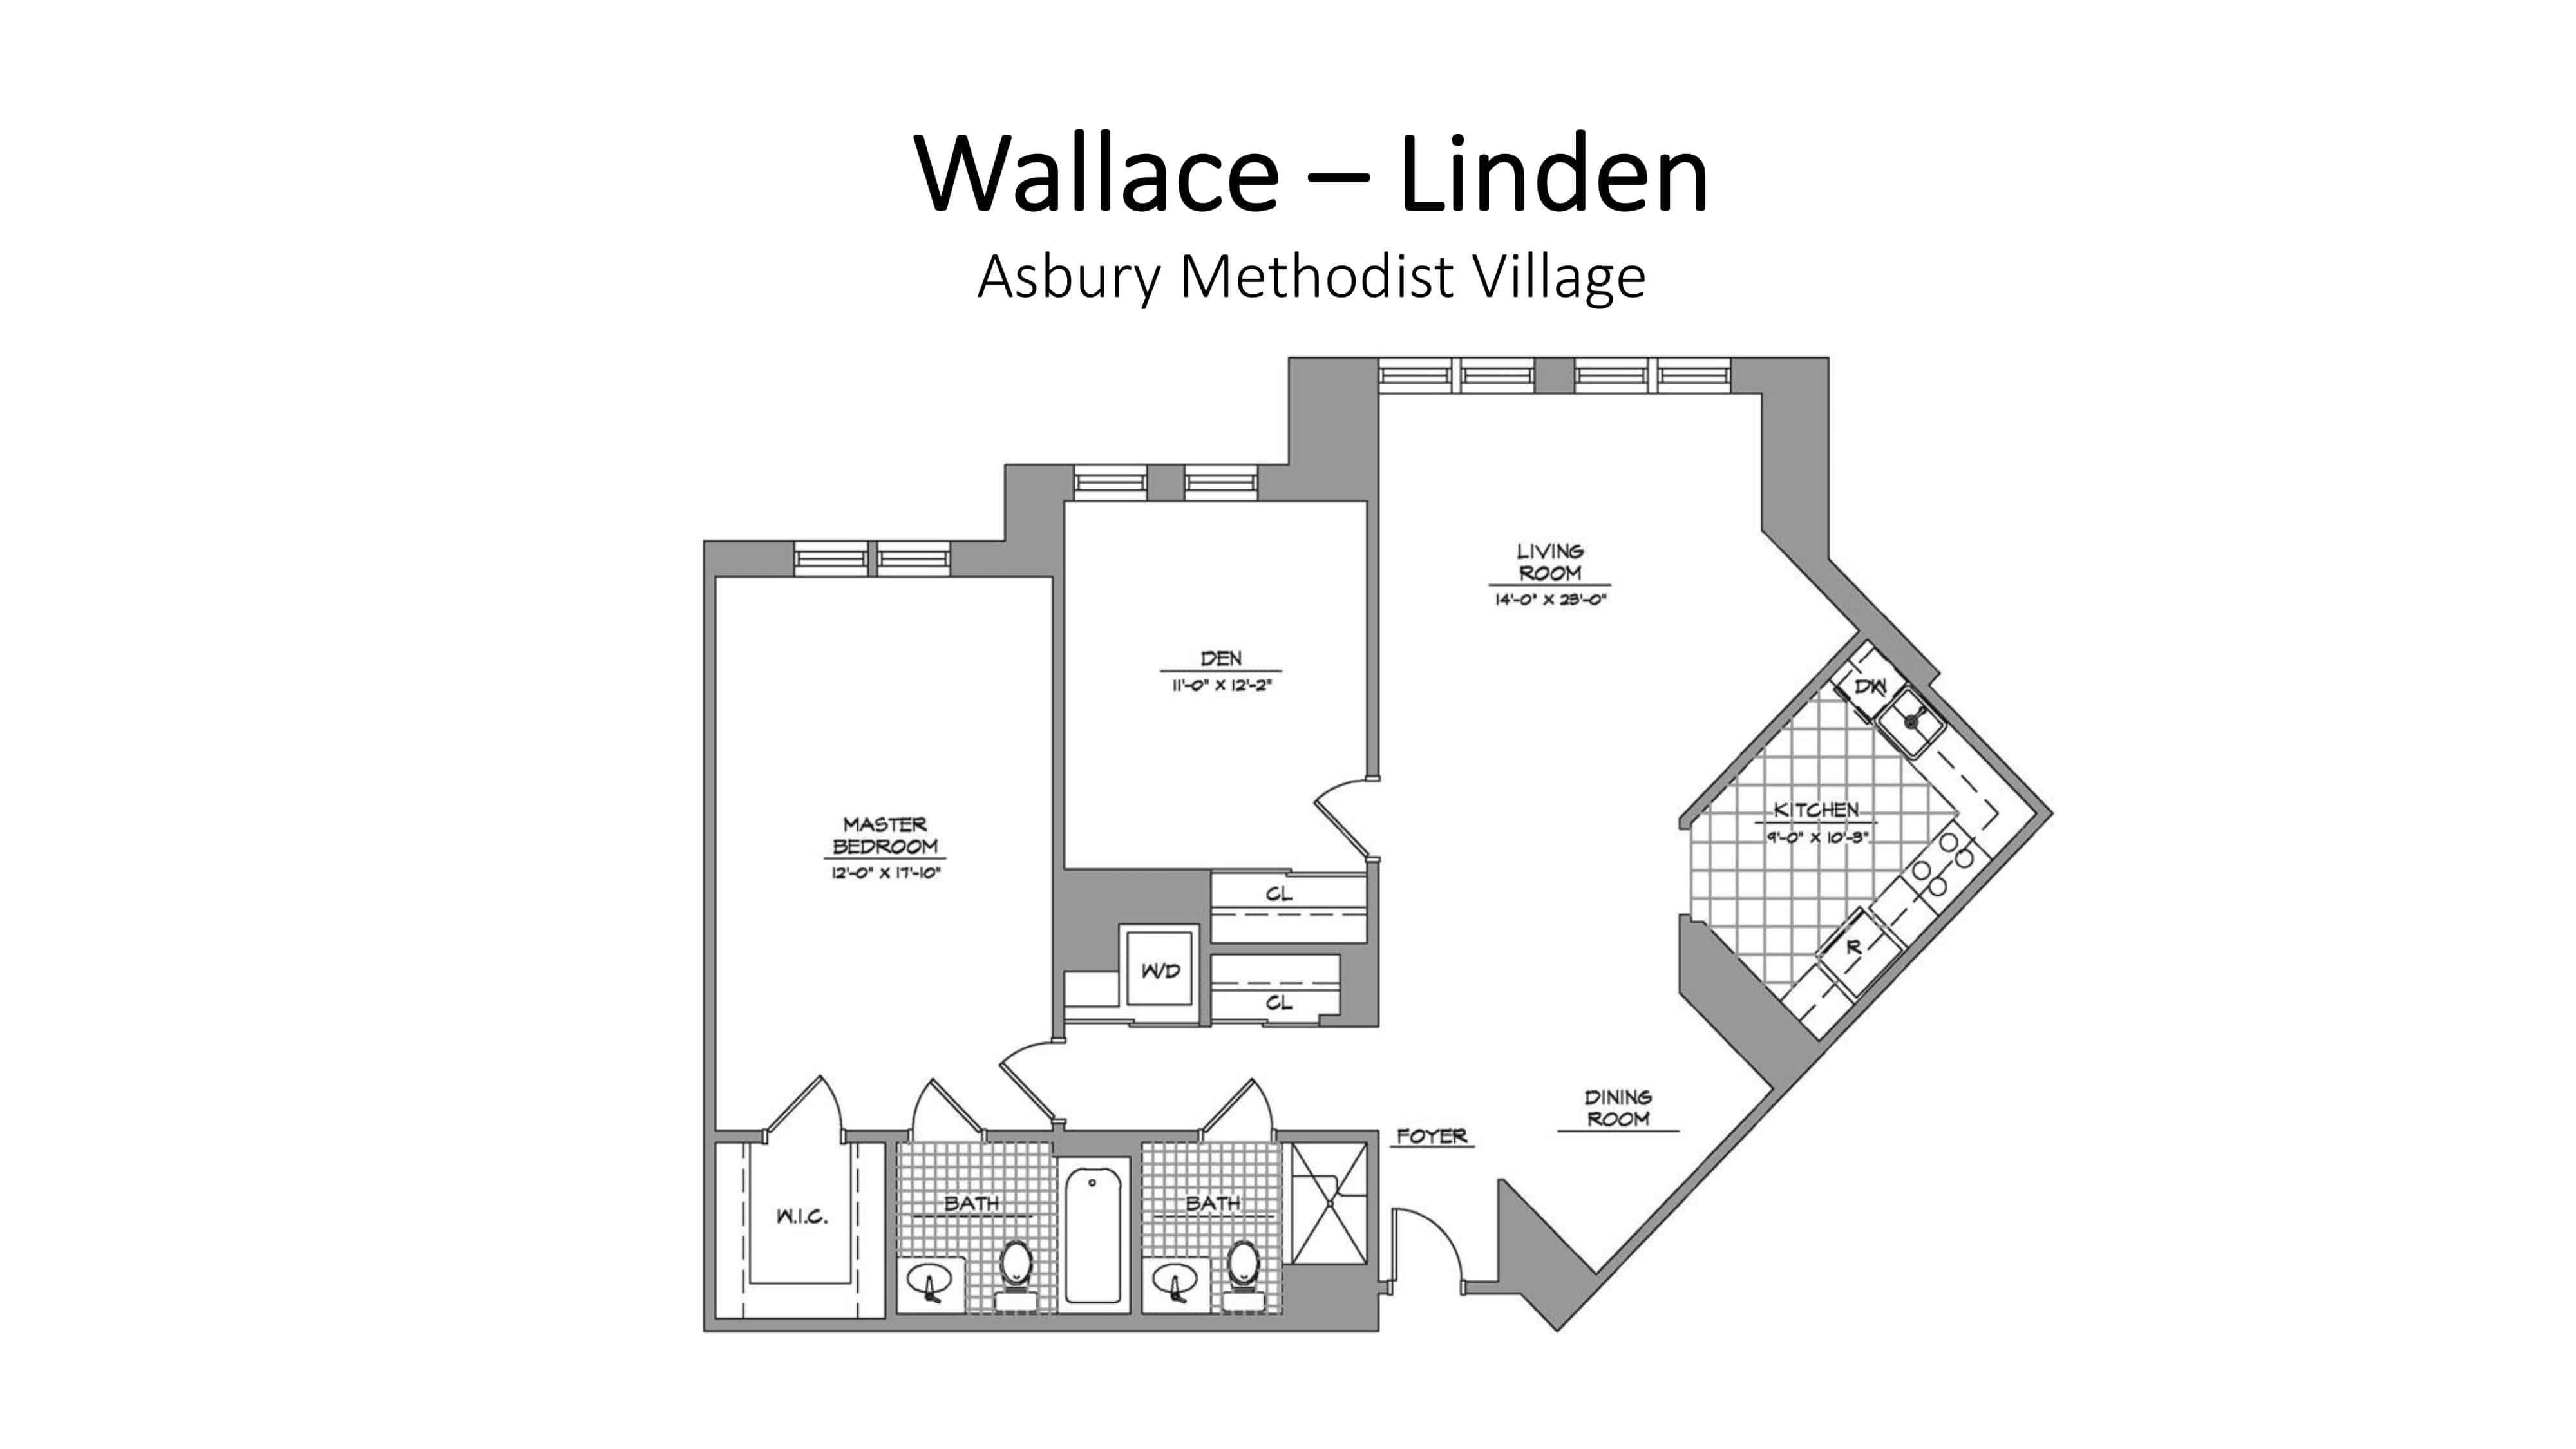 AMV Wallace Linden